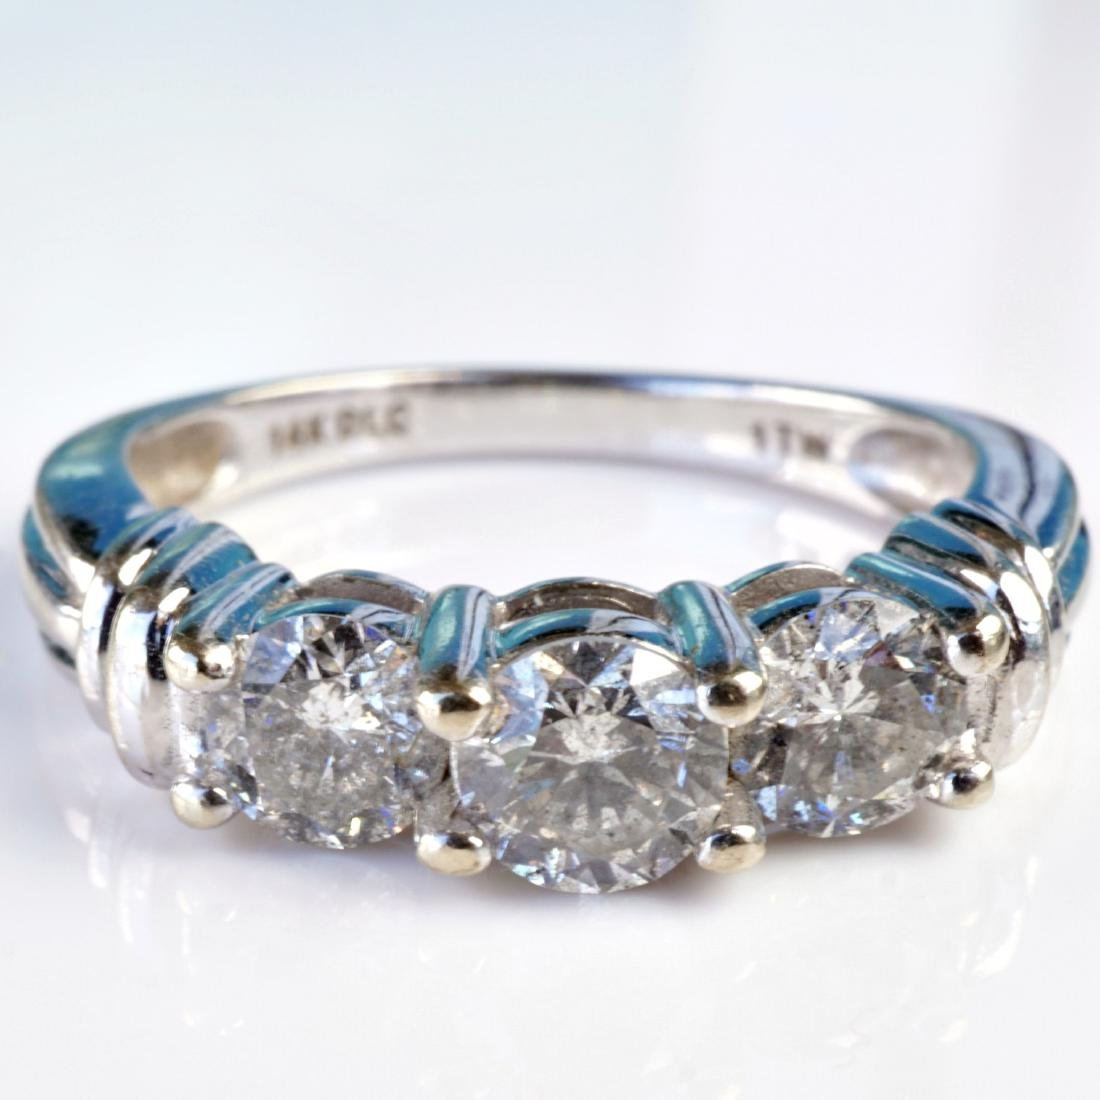 14k WG 1 CT Diamond Ring sz 6.75